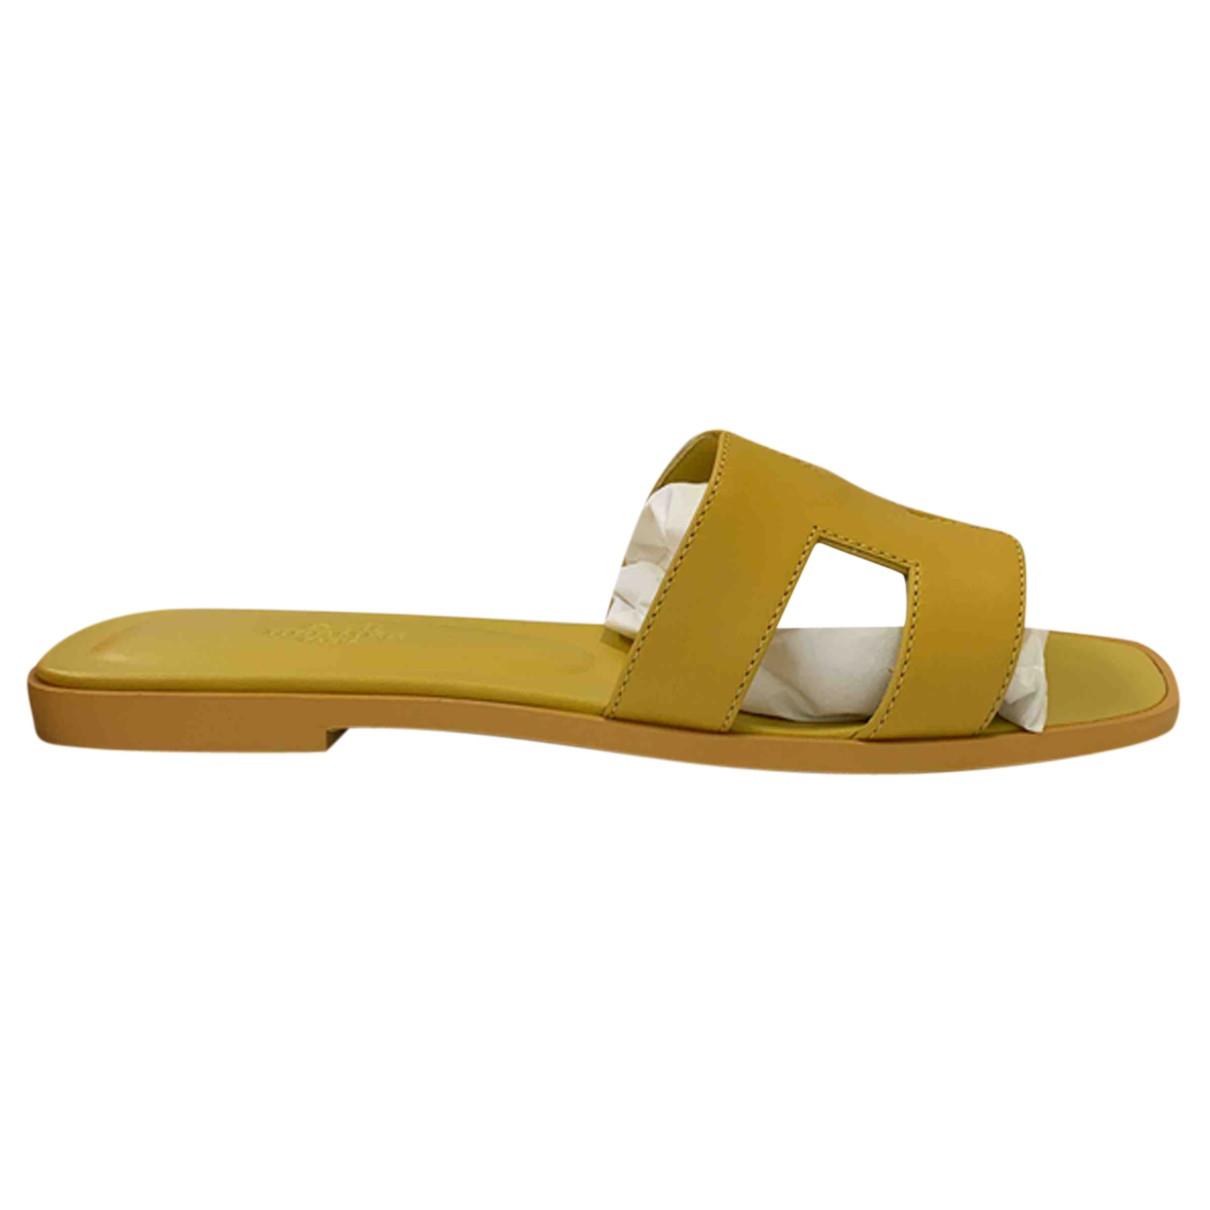 Hermes - Sandales Oran pour femme en cuir - jaune